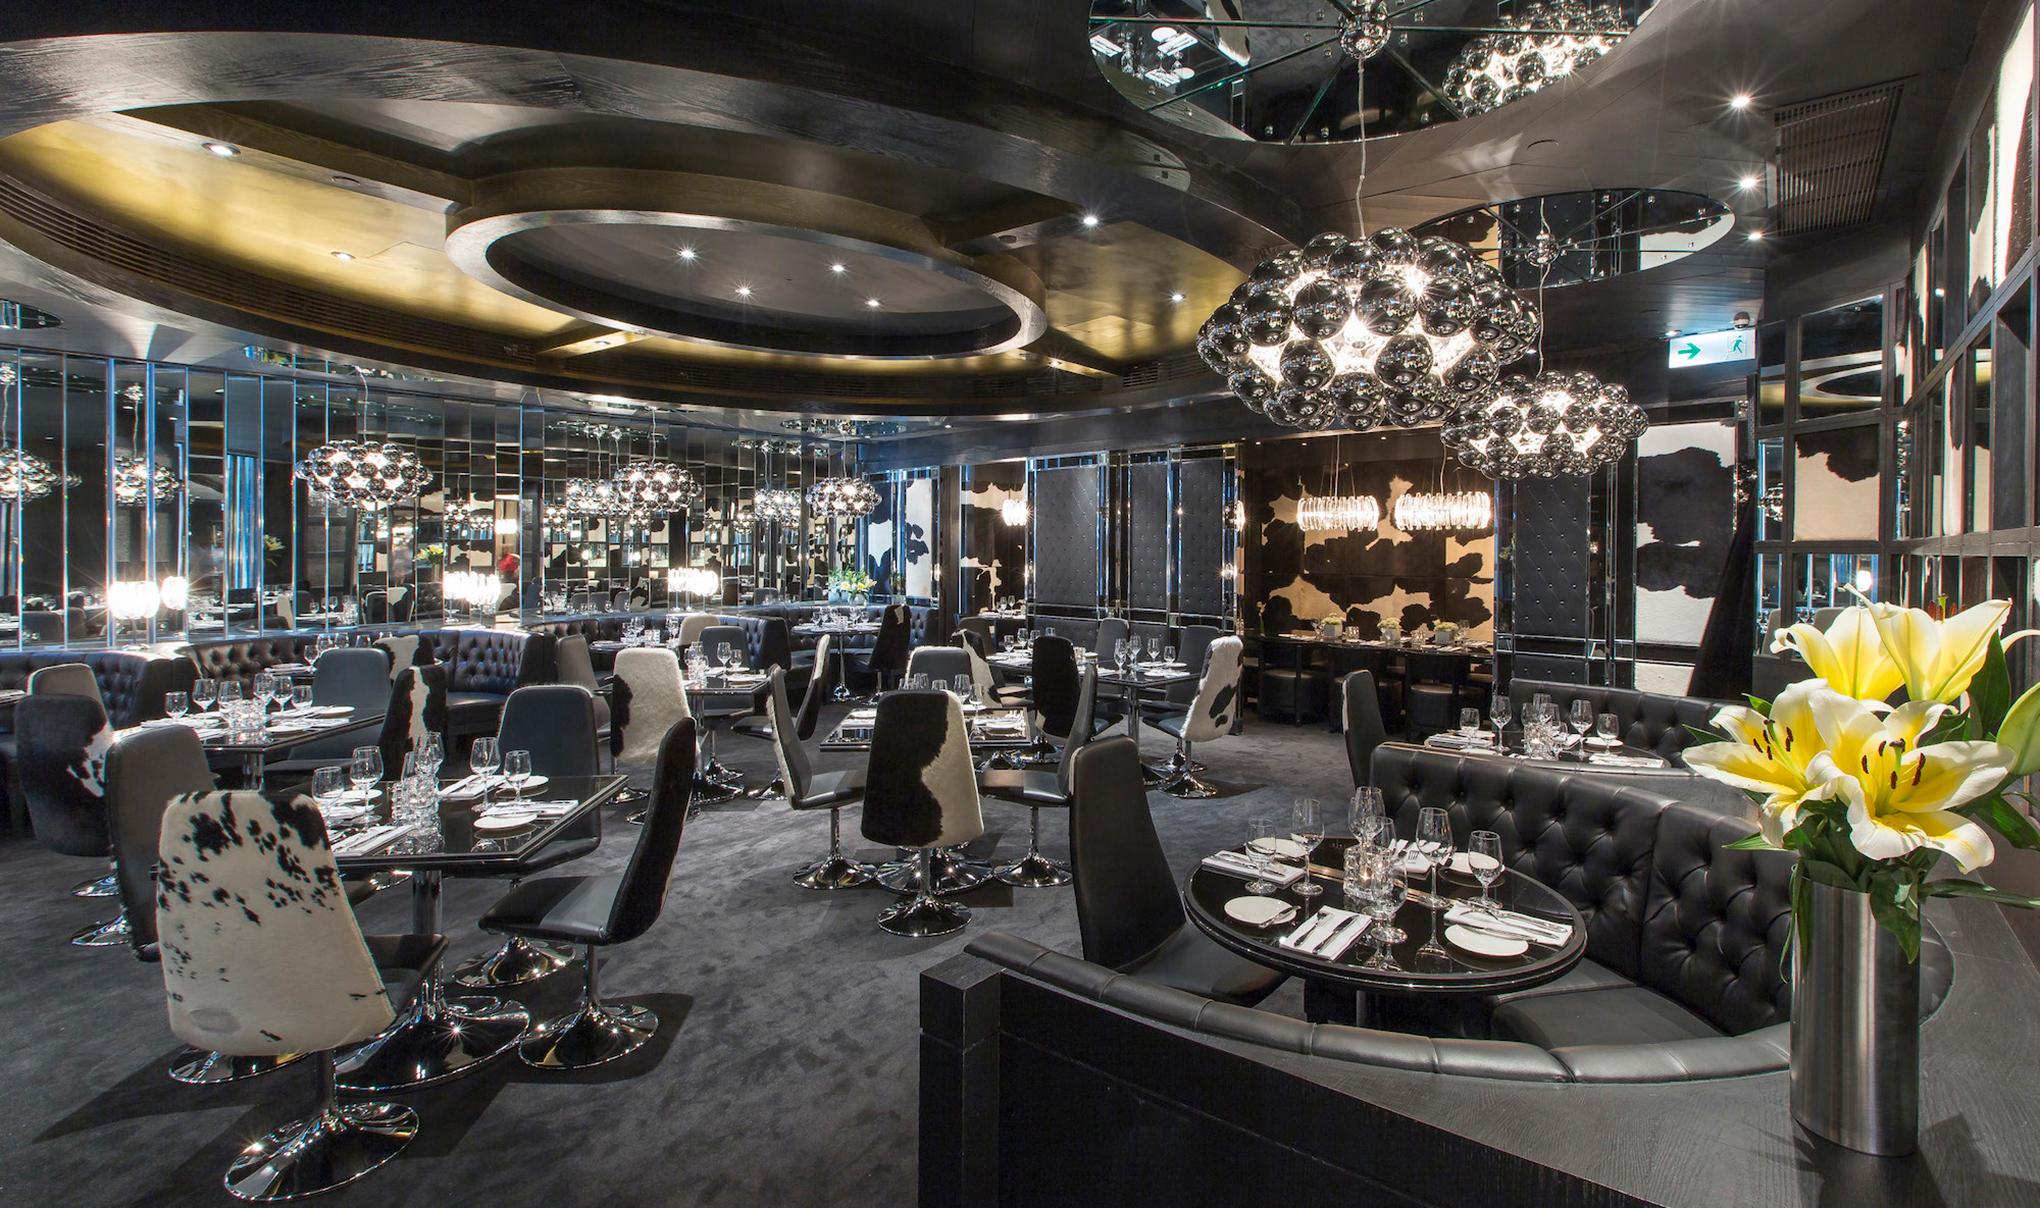 Inside of Gaucho restaurant.